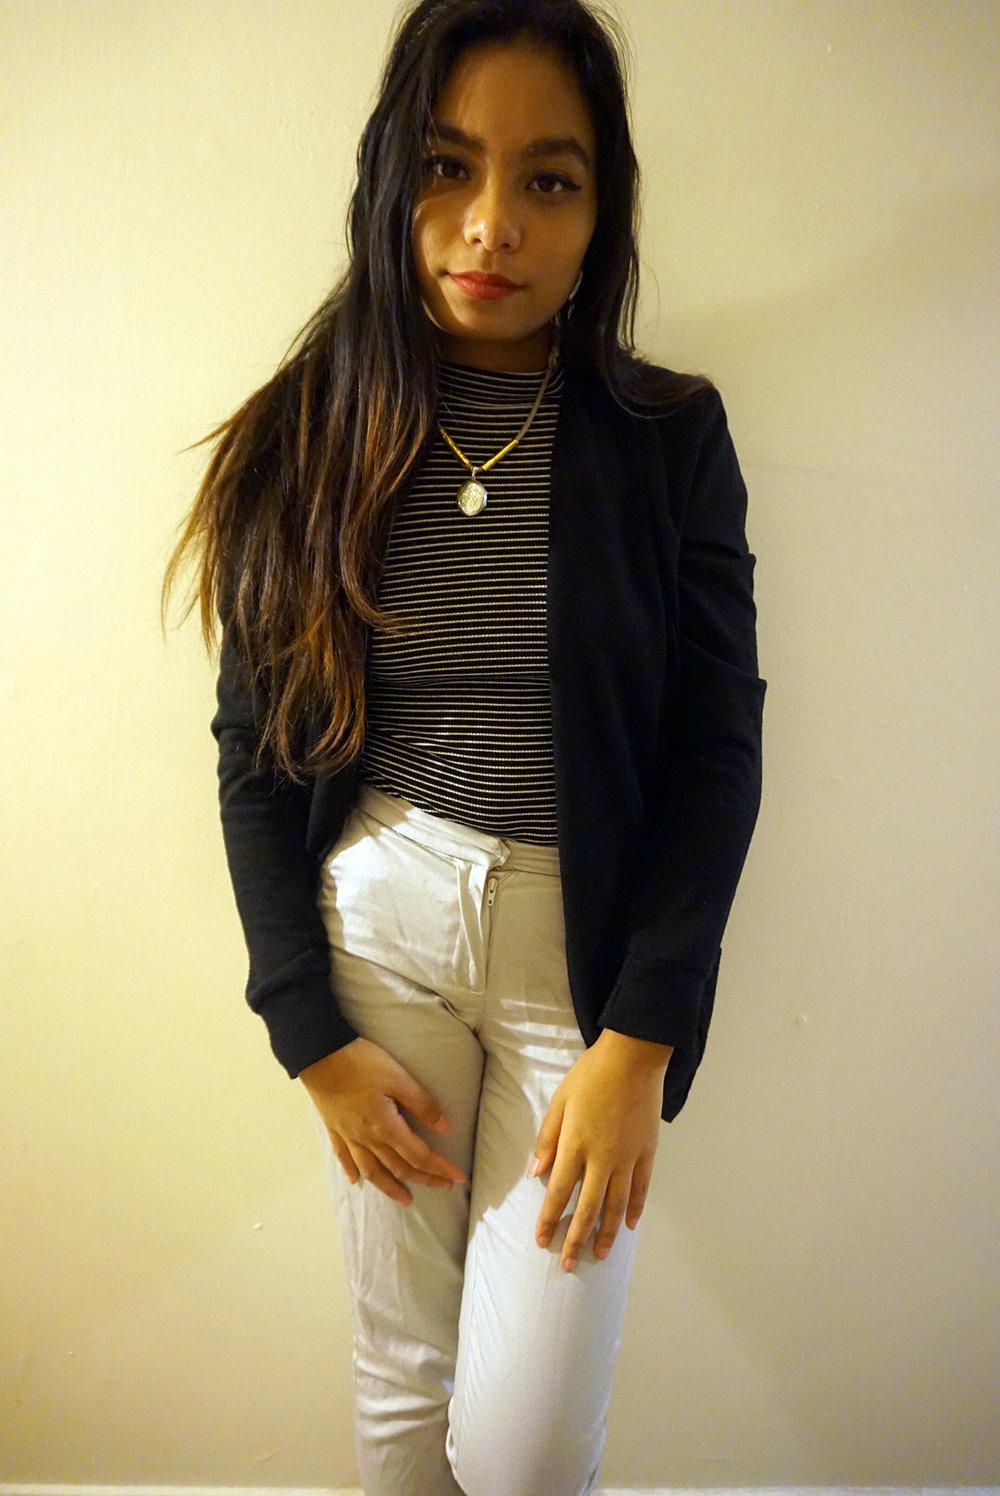 Bodysuits-Dress-Pants-Office-Wear-Blogger-Style-LINDATENCHITRAN-21-x1080x1616 .jpg